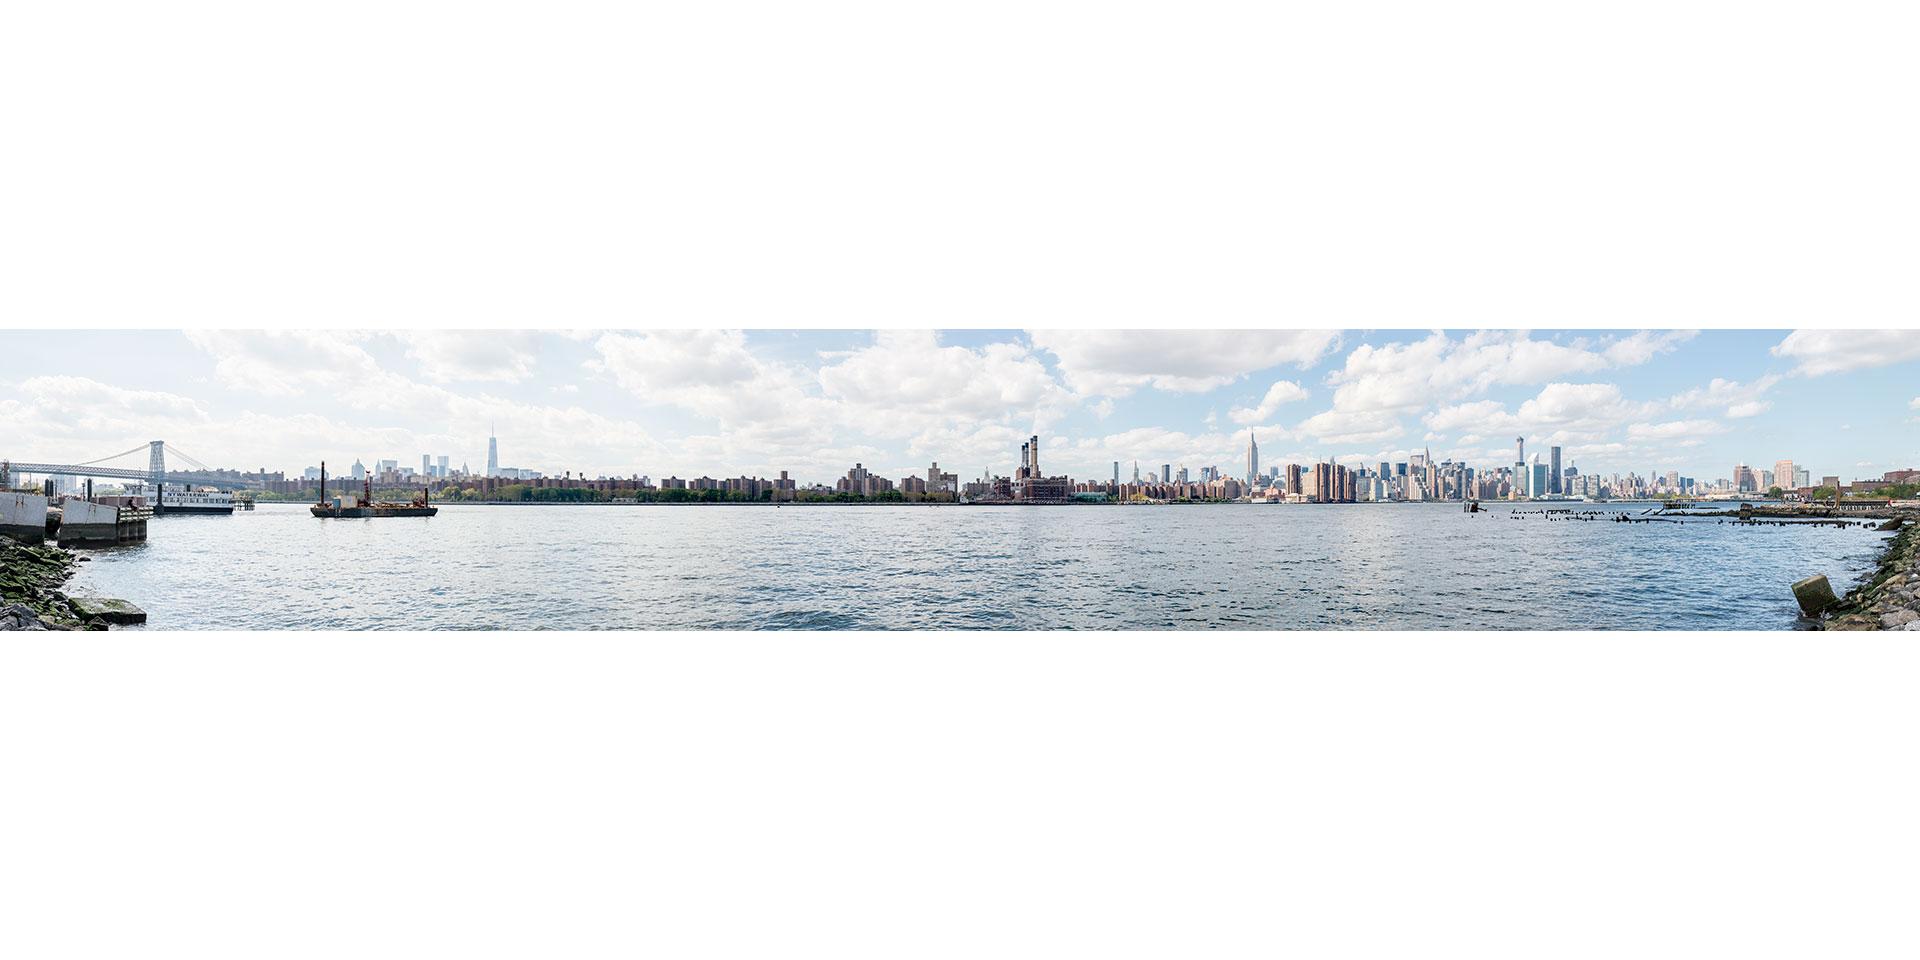 Manhattan - New York City - USA